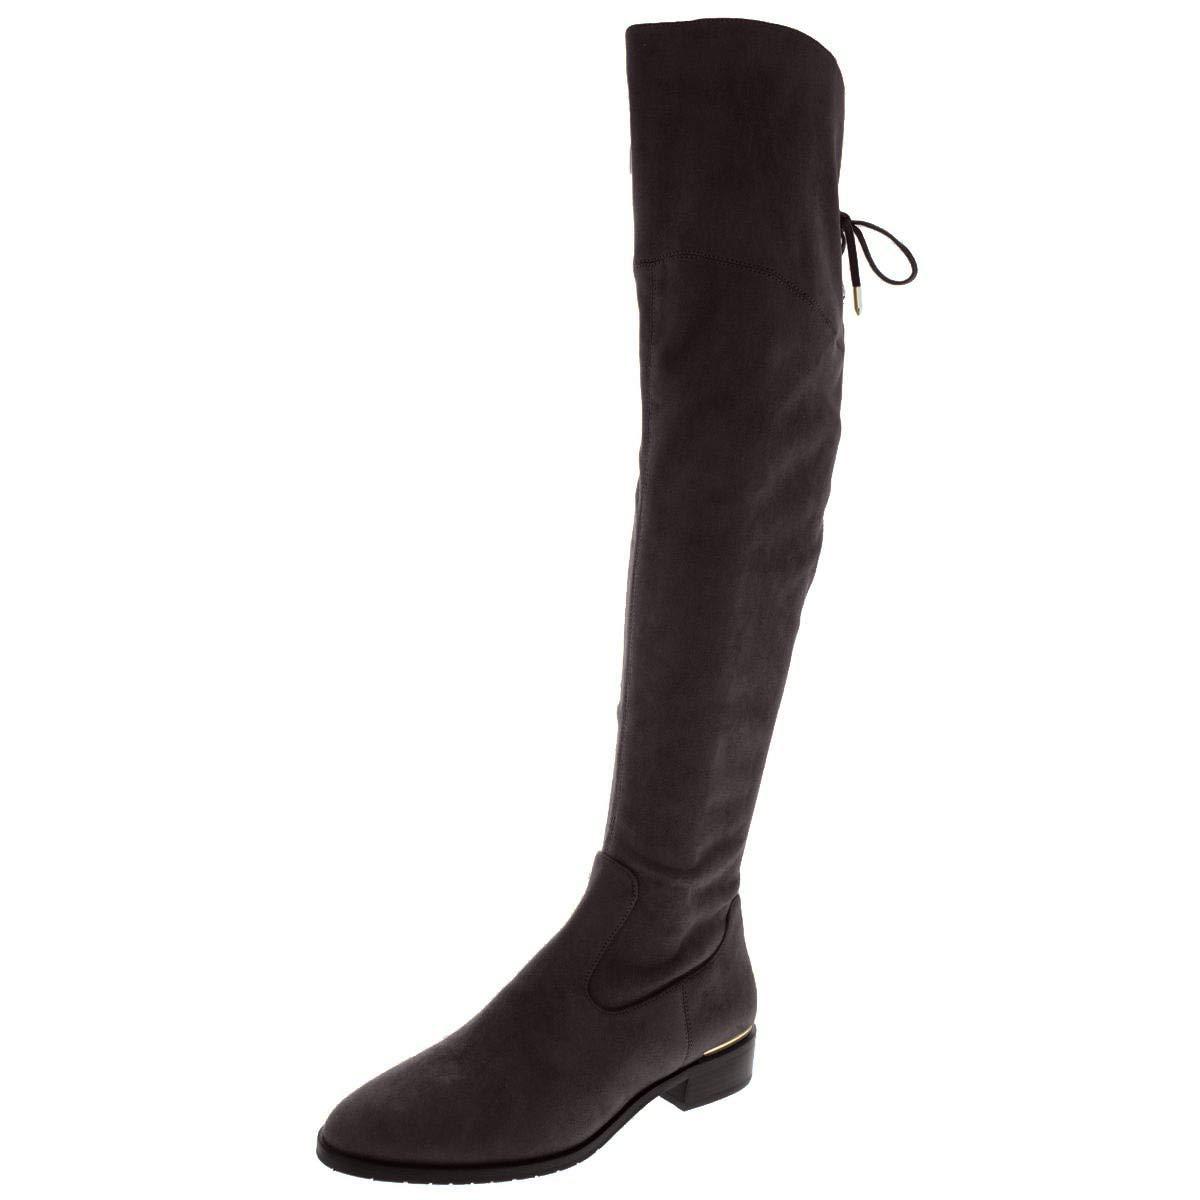 Ivanka Trump Womens Lnde Closed Toe Over Knee Fashion Boots,